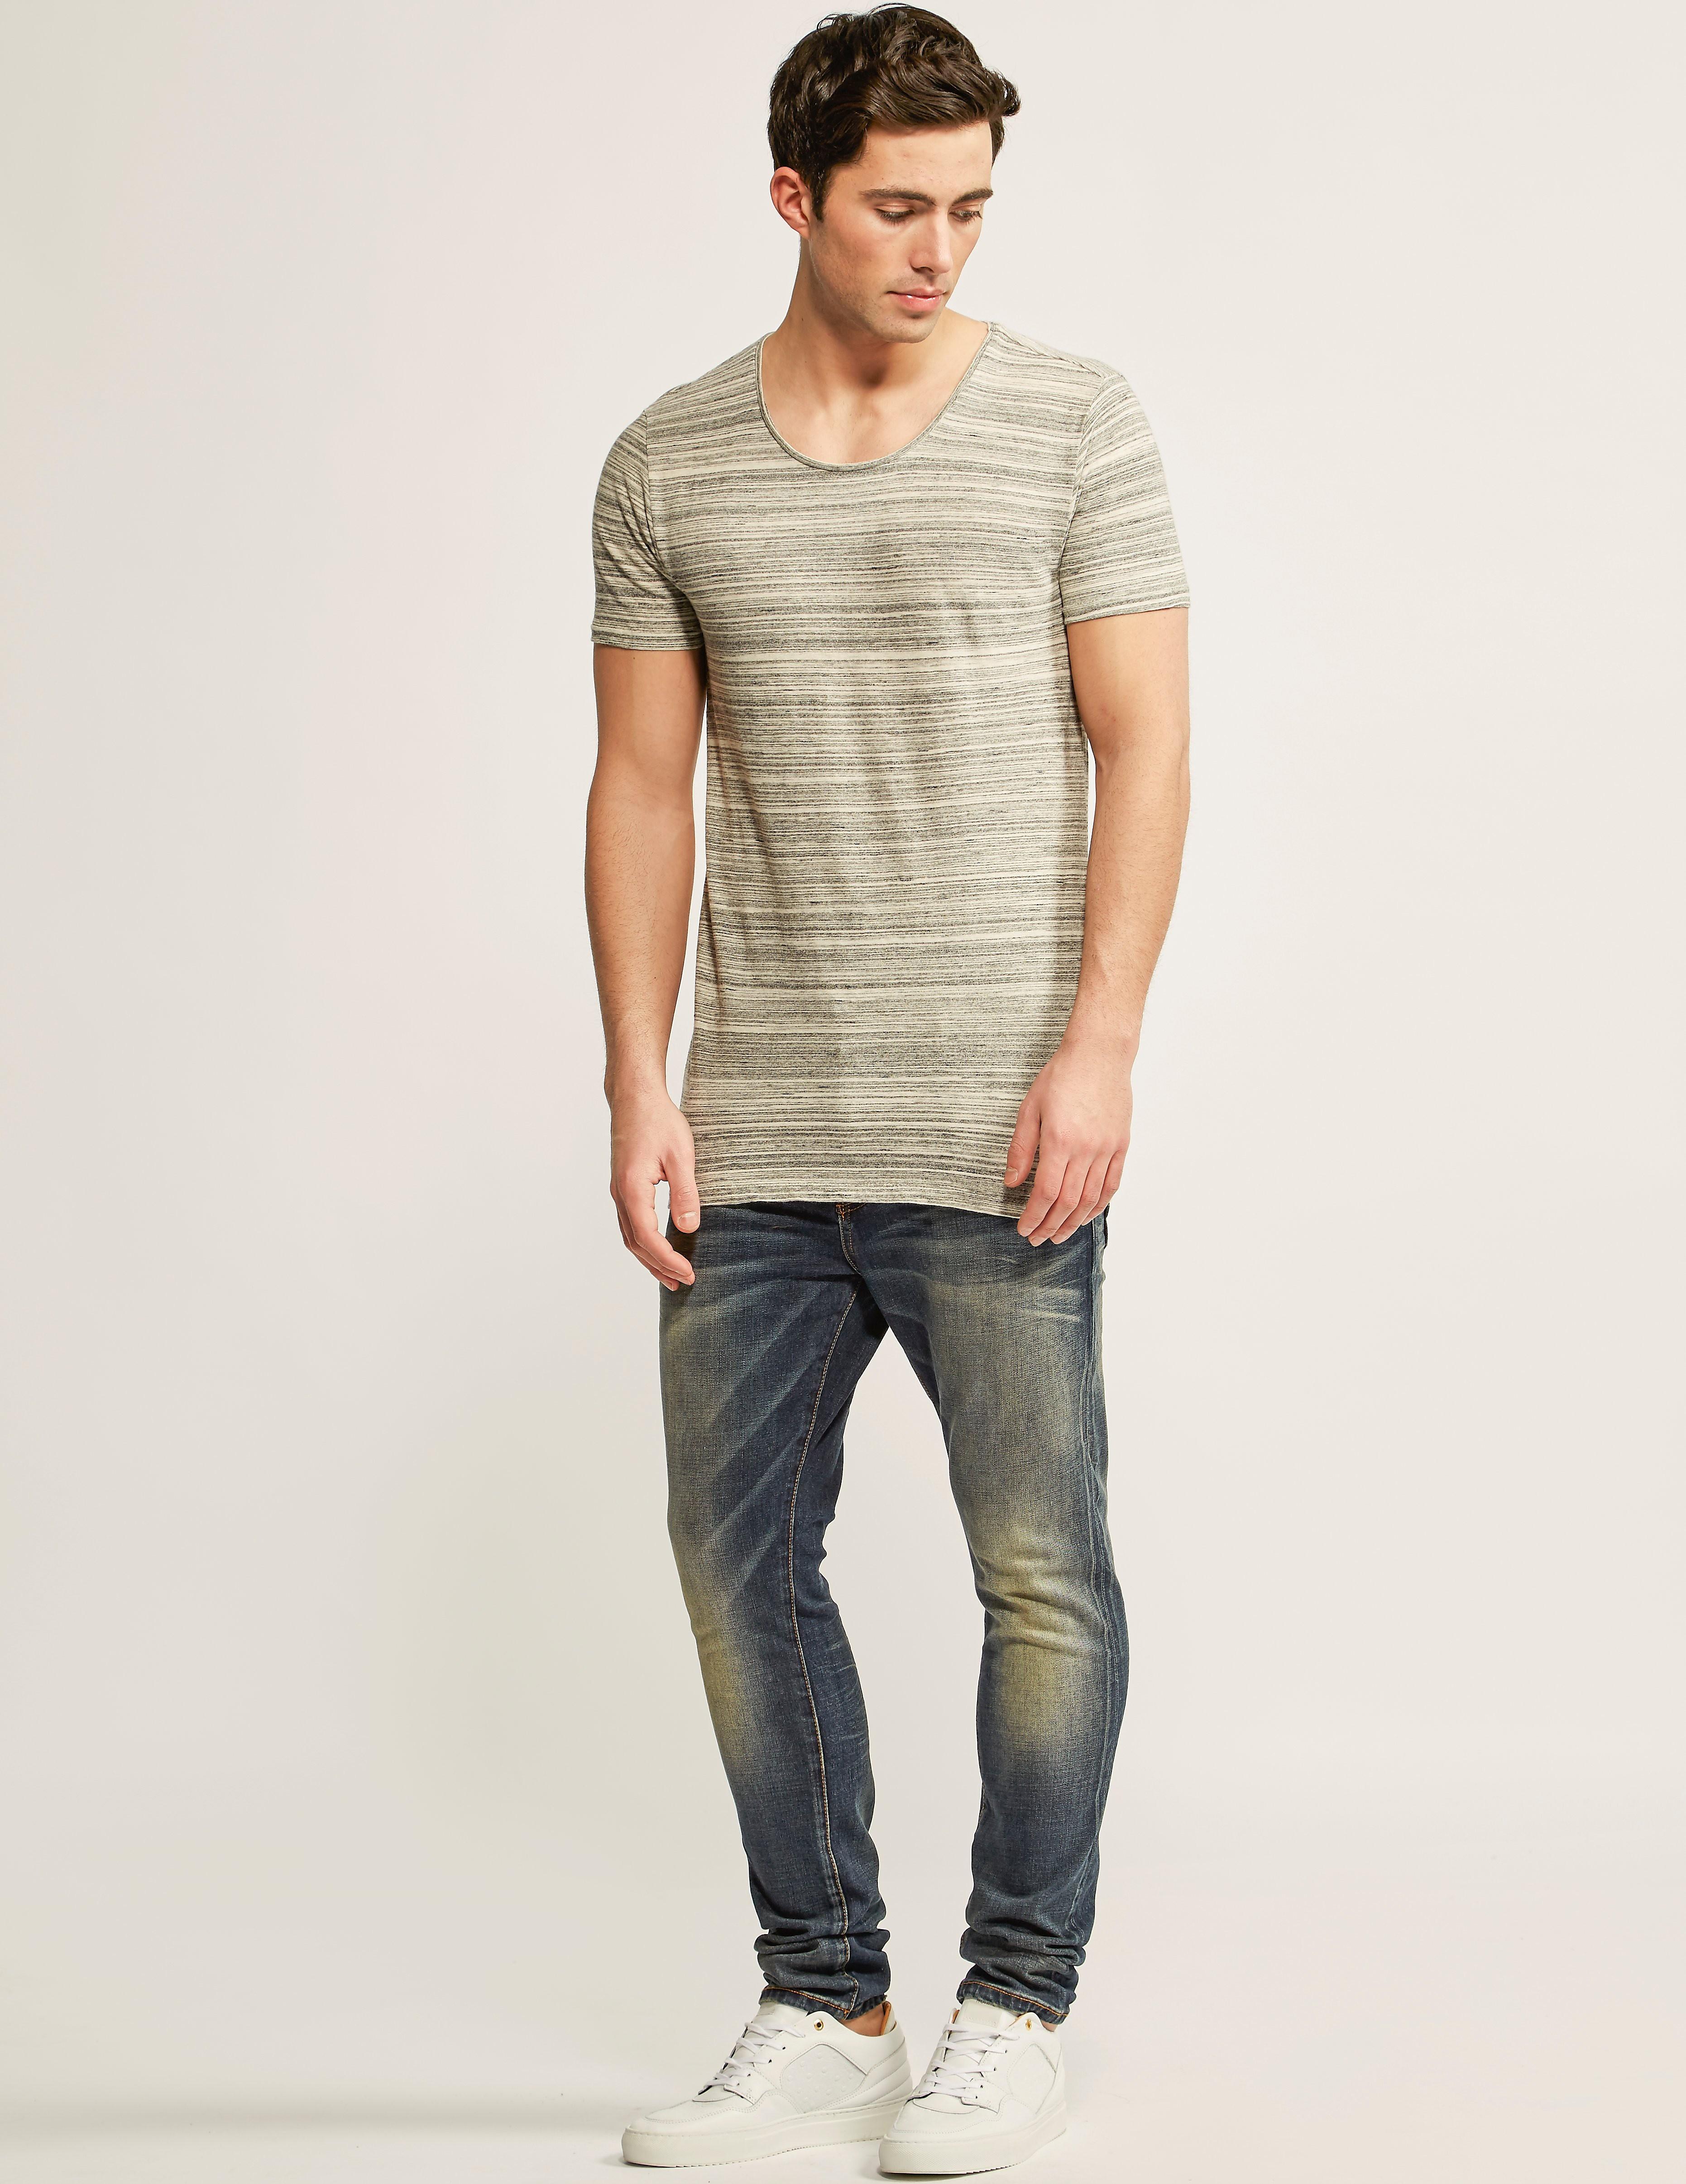 Scotch & Soda Home Alone Short Sleeve T-Shirt